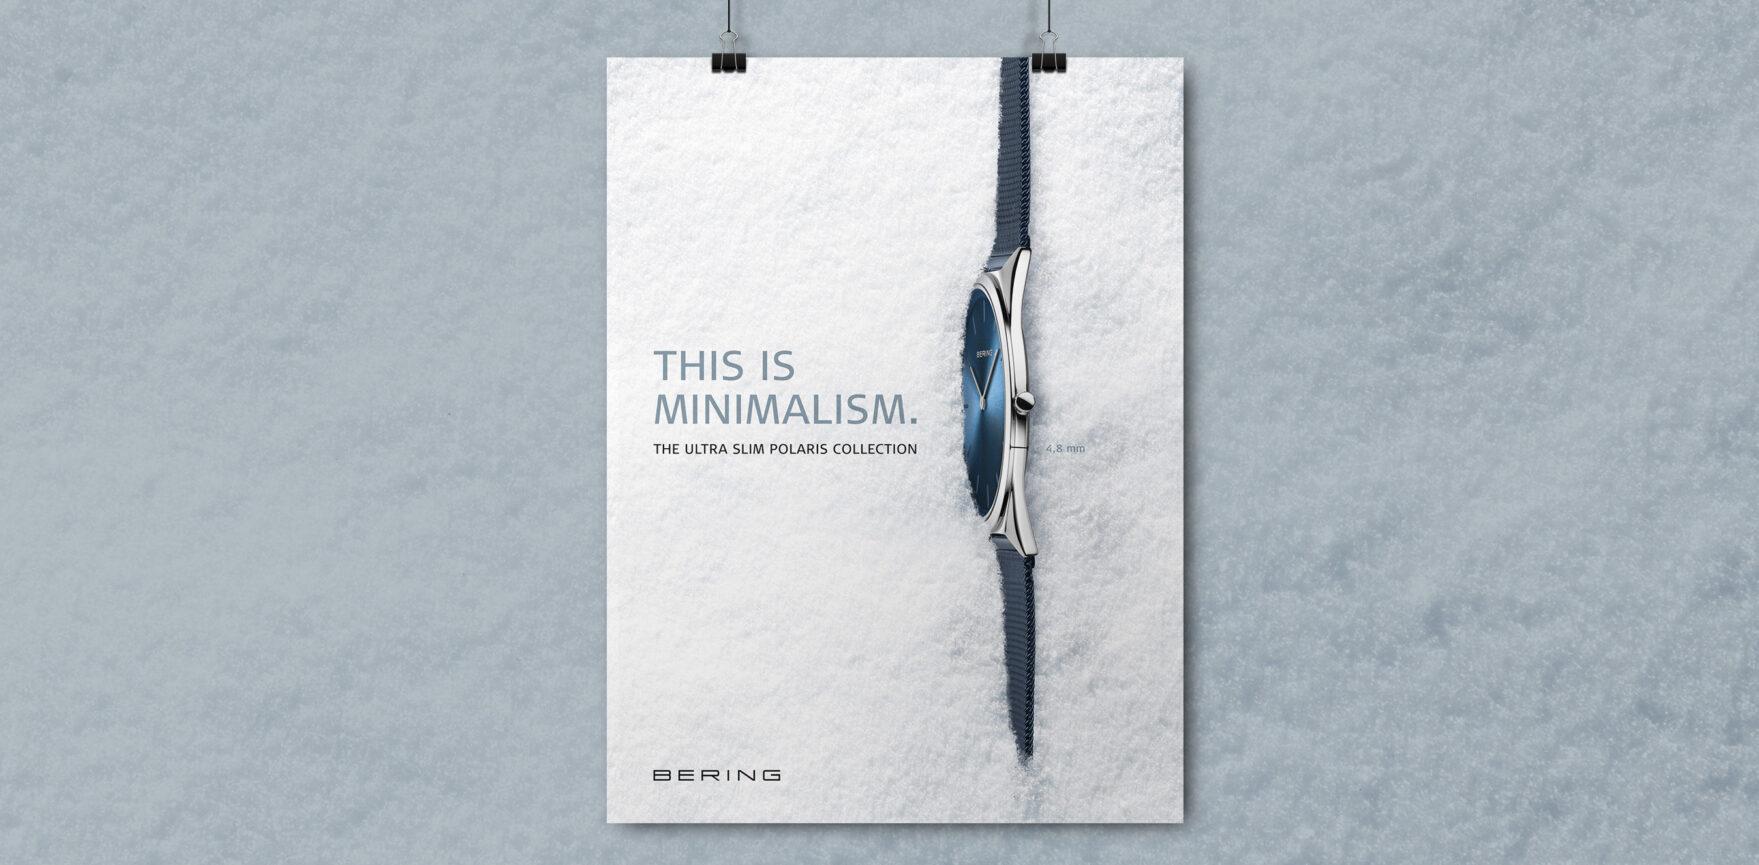 BERING Branding ULTRA SLIM Kollektion Uhr im Schnee Plakat Keyvisual